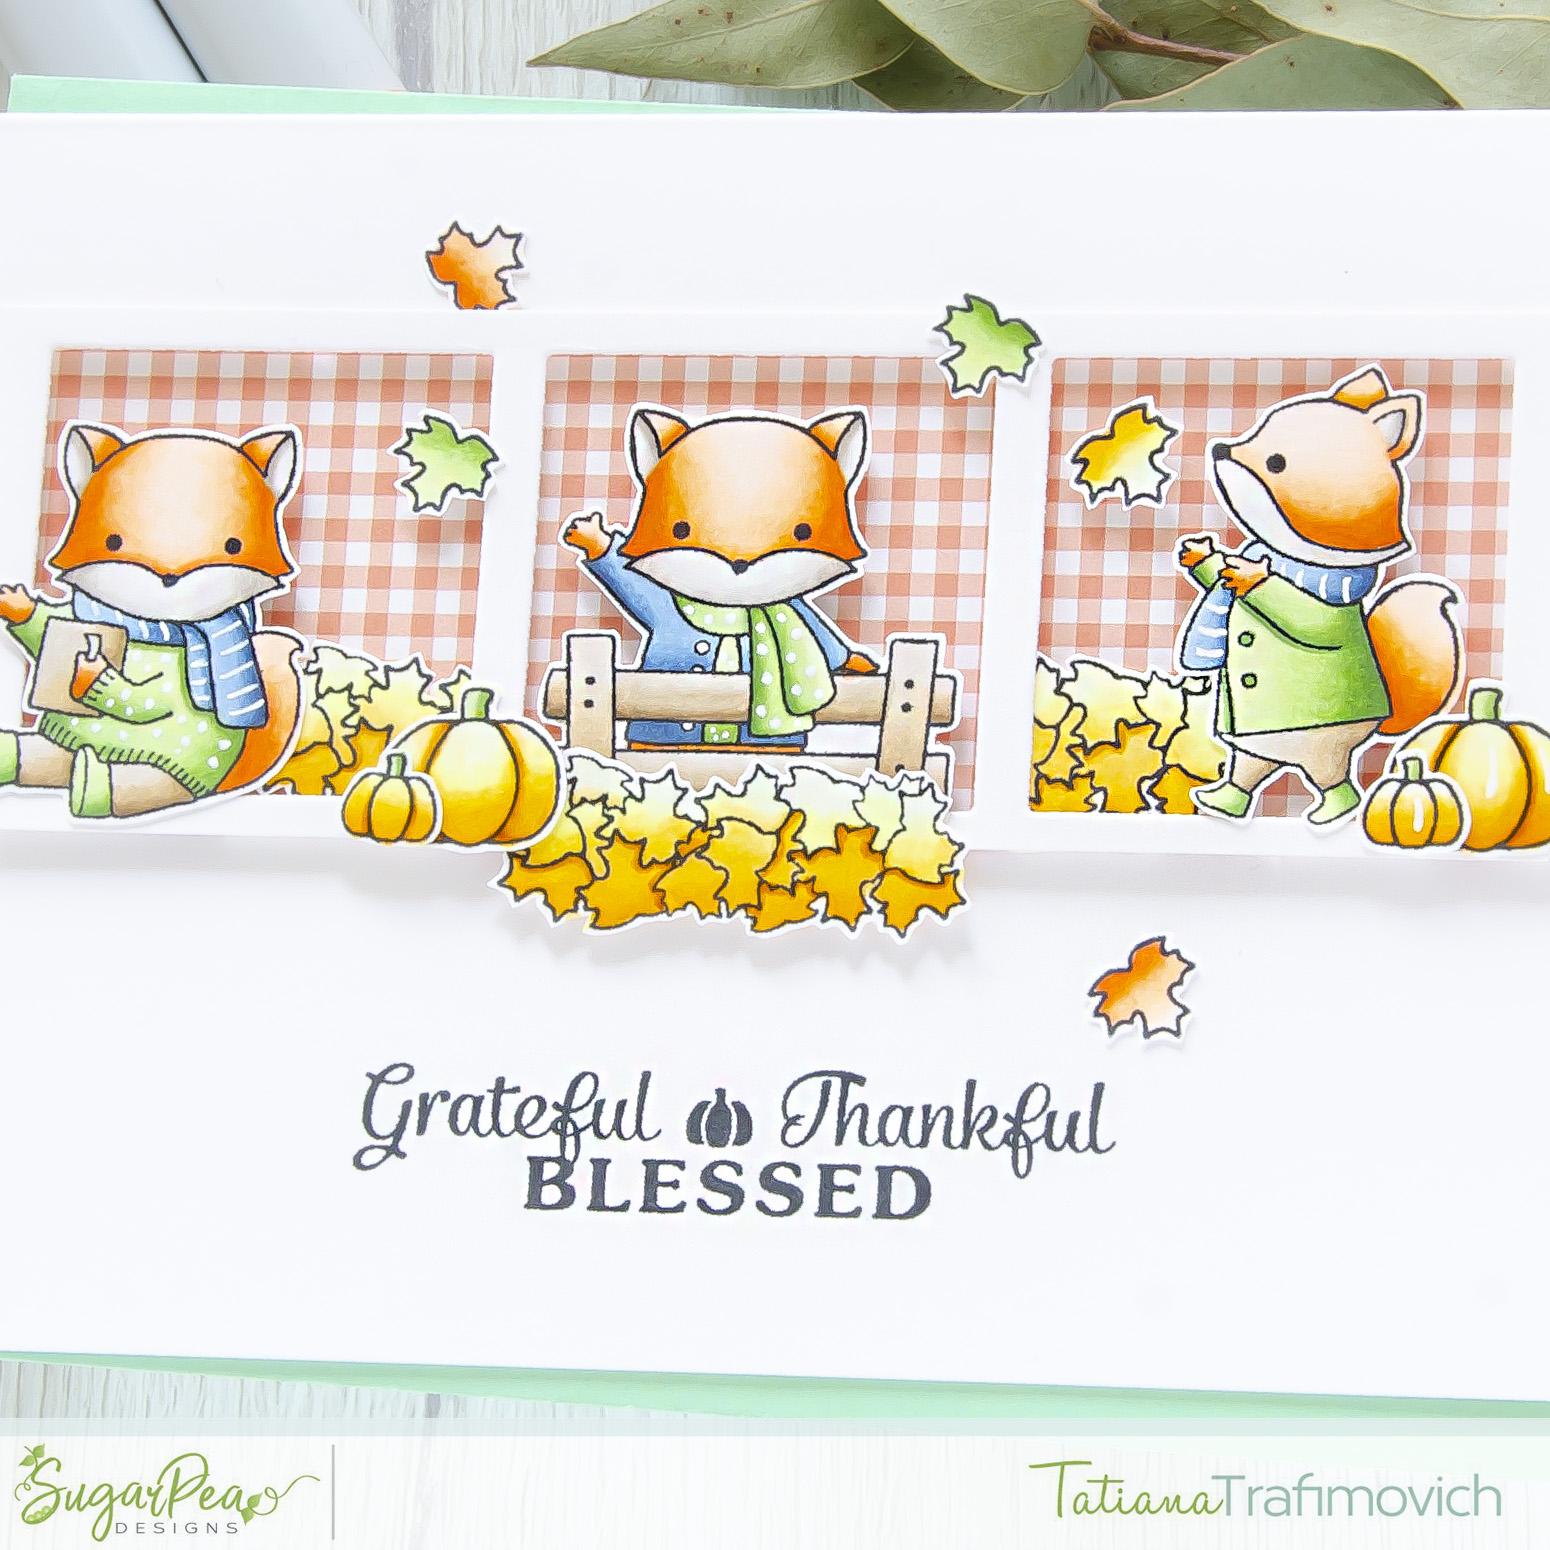 Grateful Thankful Blessed #handmade card by Tatiana Trafimovich #tatianacraftandart - Fall Fox stamp set by SugarPea Designs #sugarpeadesigns